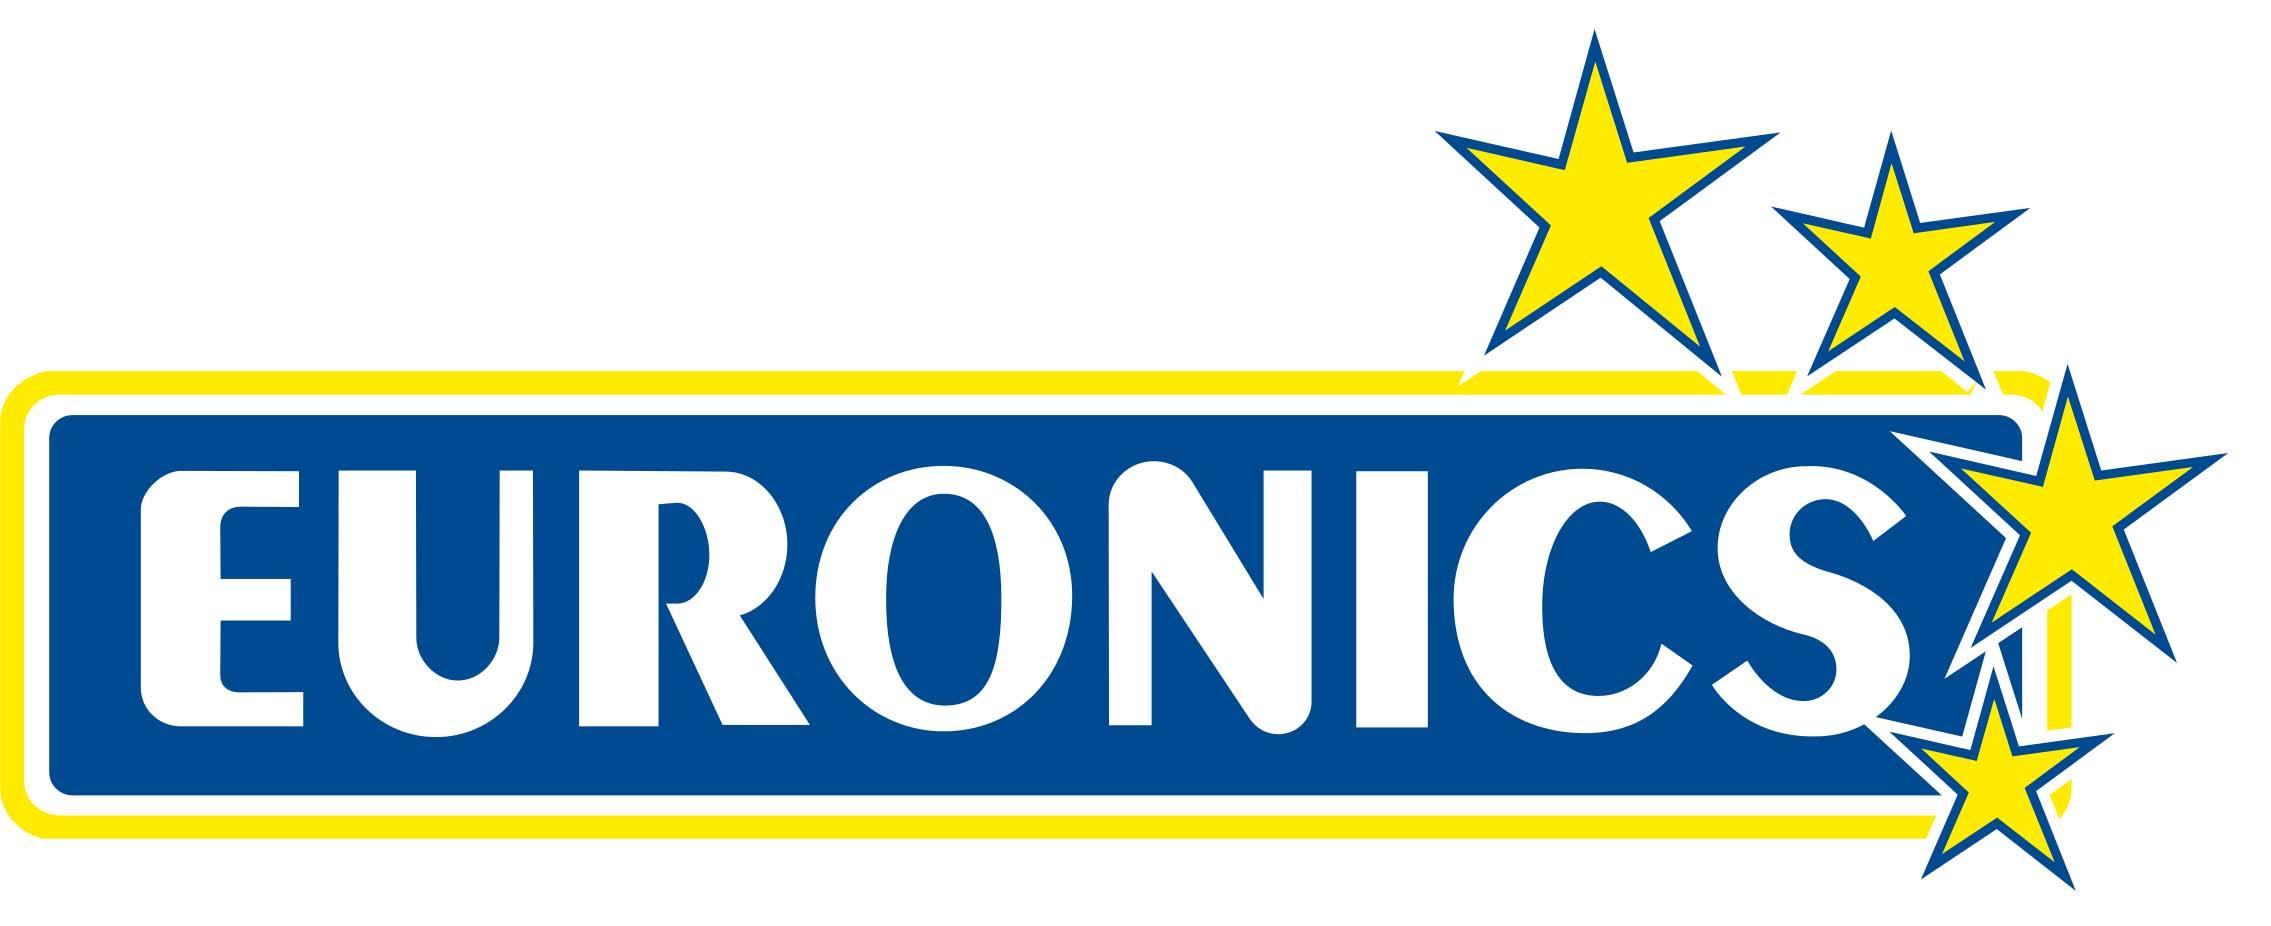 Euronics_logo.jpg